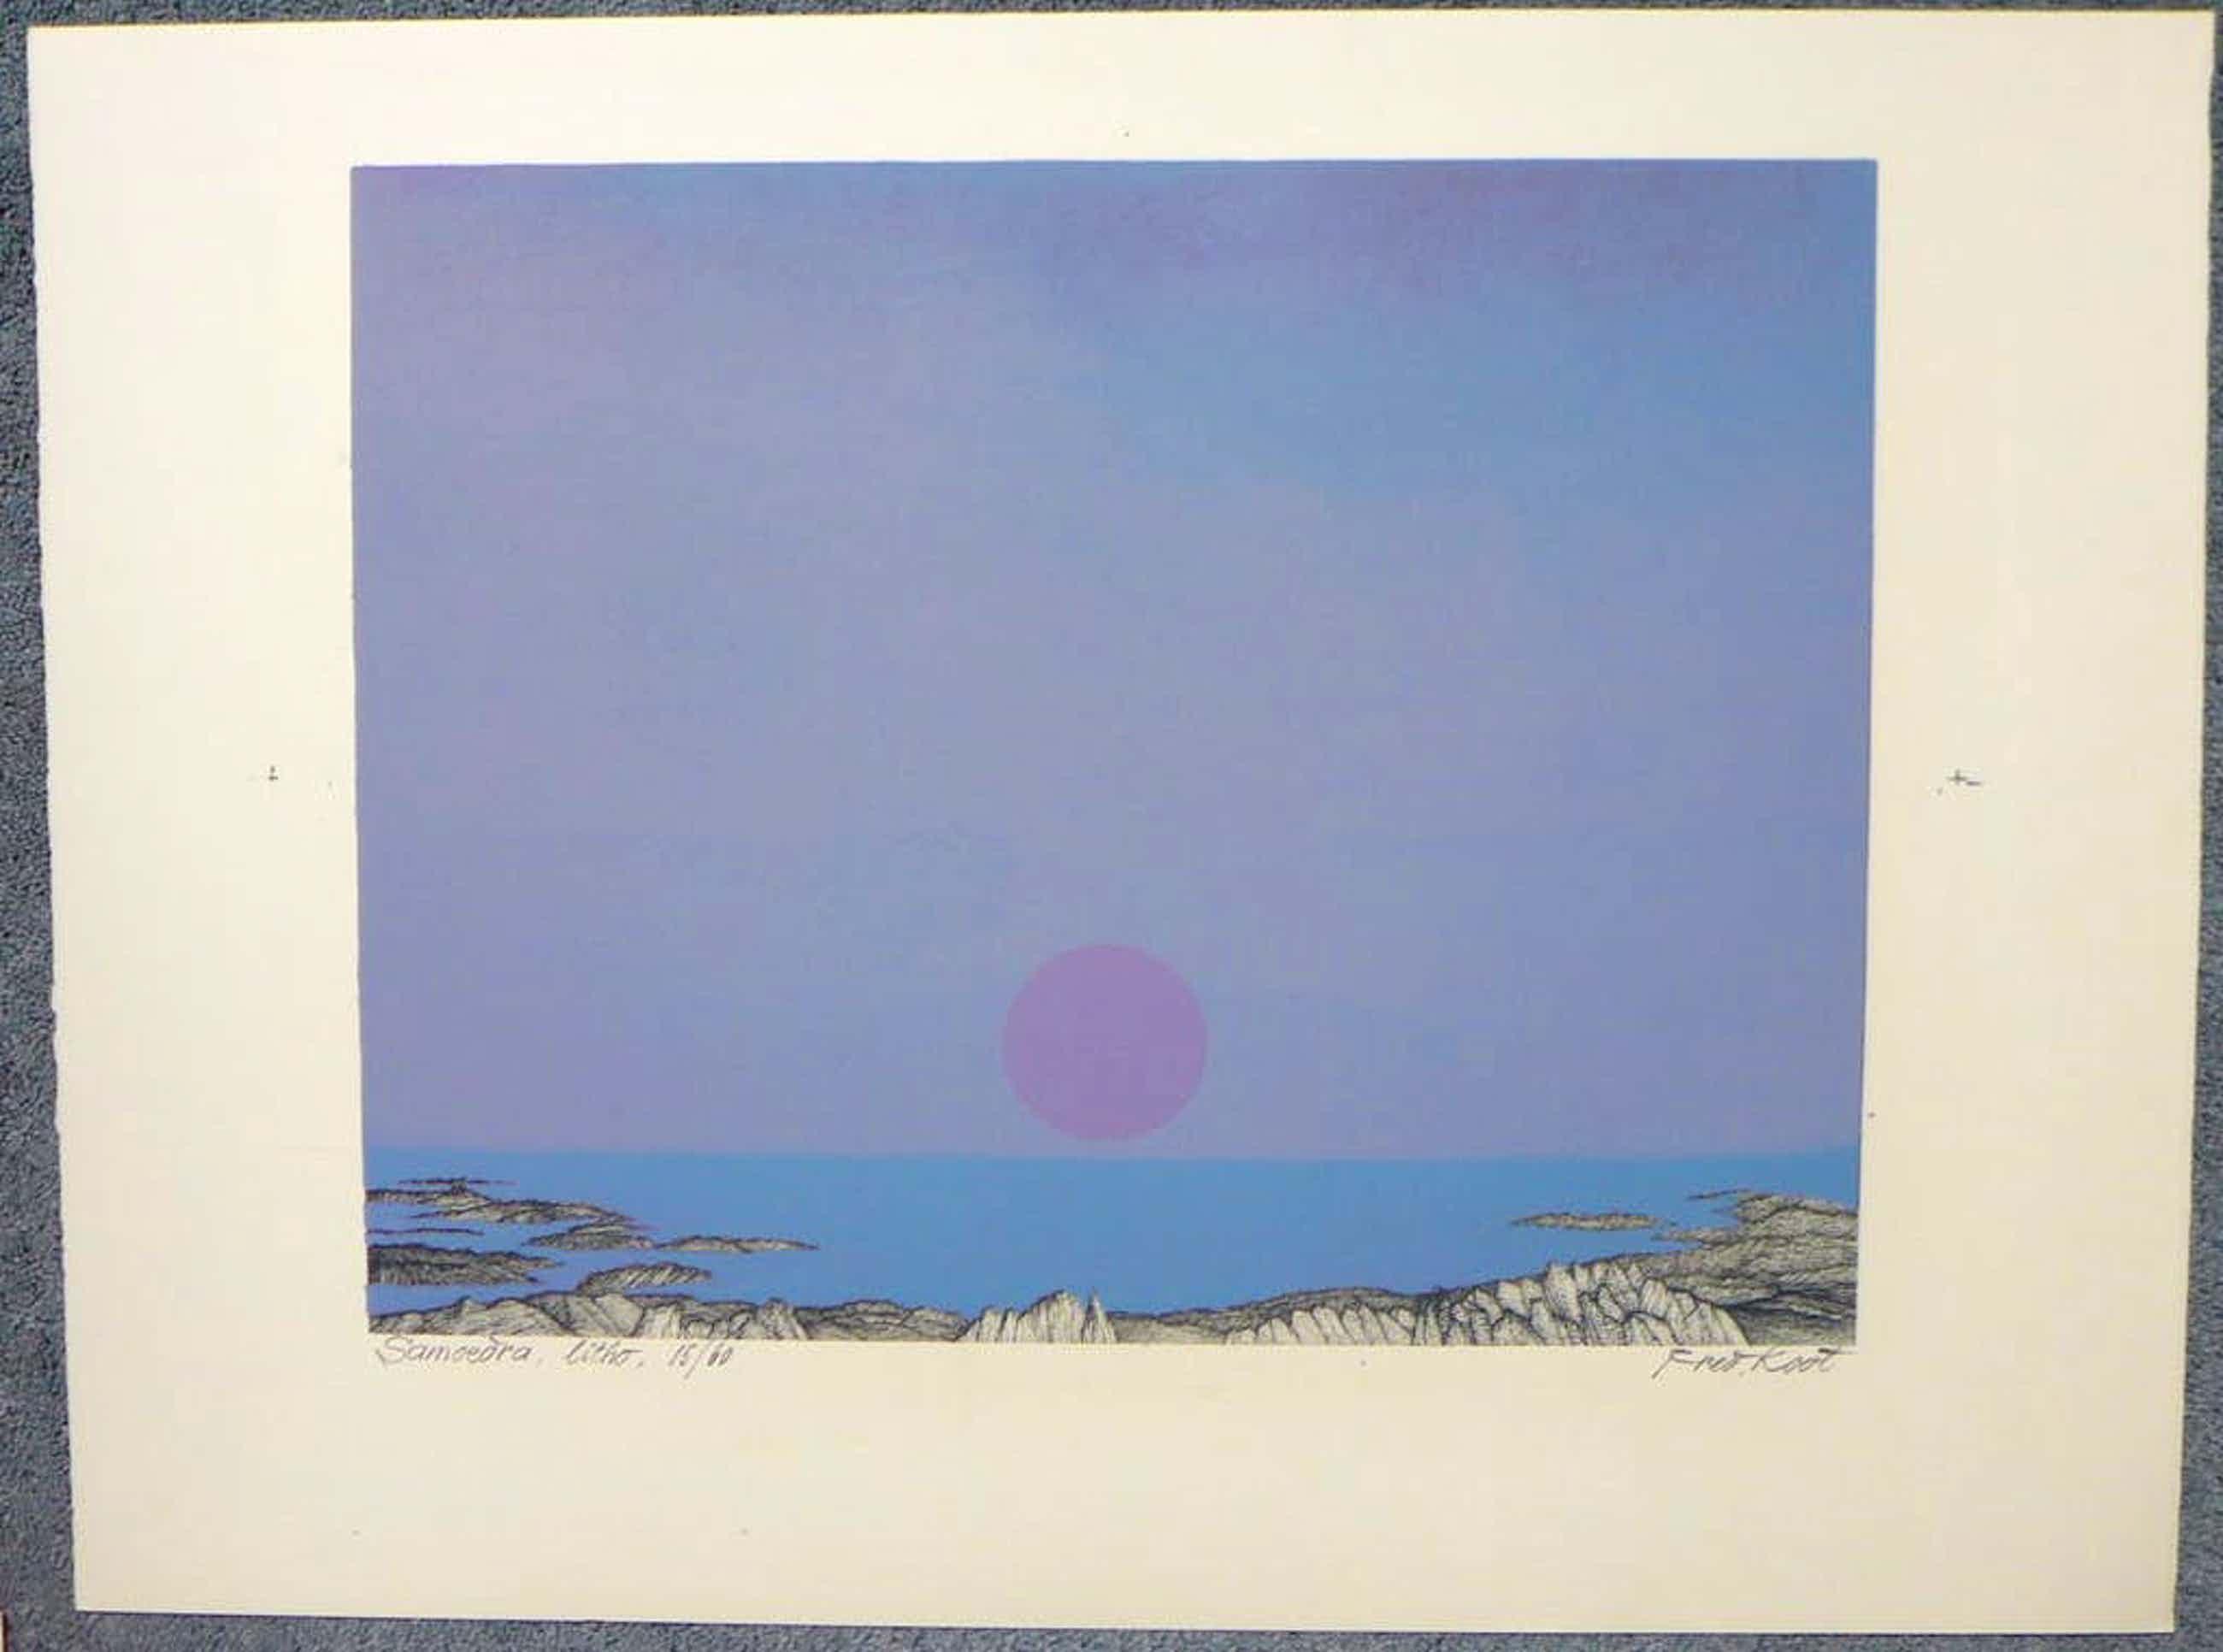 Fred Koot - Fred Koot, litho, titel Samoedra oplage 15/60 beeldformaat 35 x 45 cm.  kopen? Bied vanaf 50!